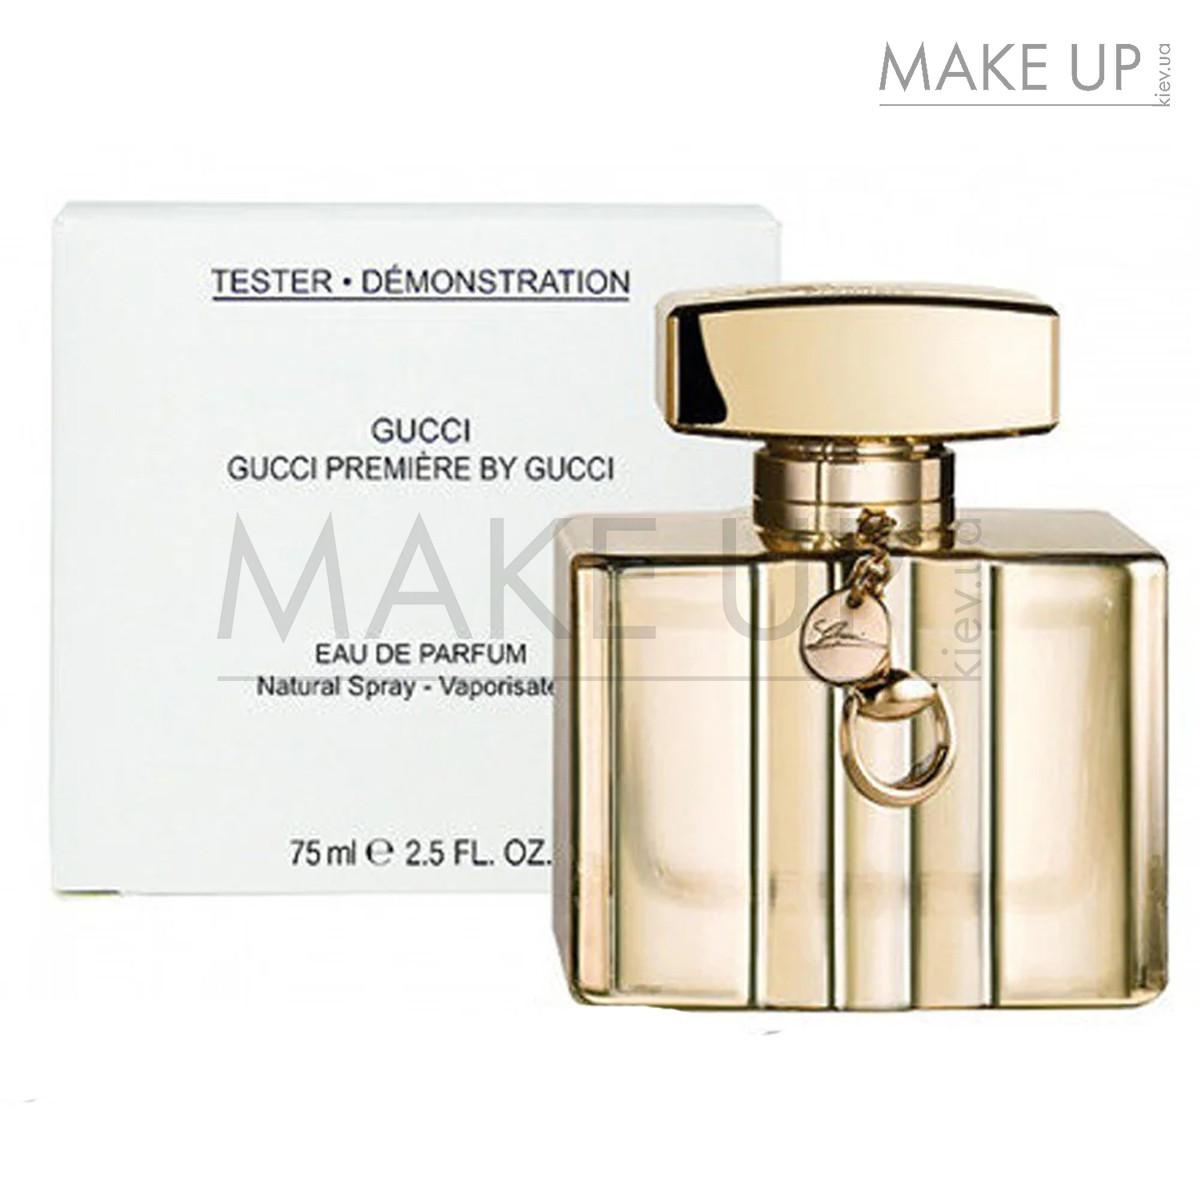 Tester женская парфюмированная вода Gucci Premiere edp 75 мл. | Лиц. ОАЭ Тестер